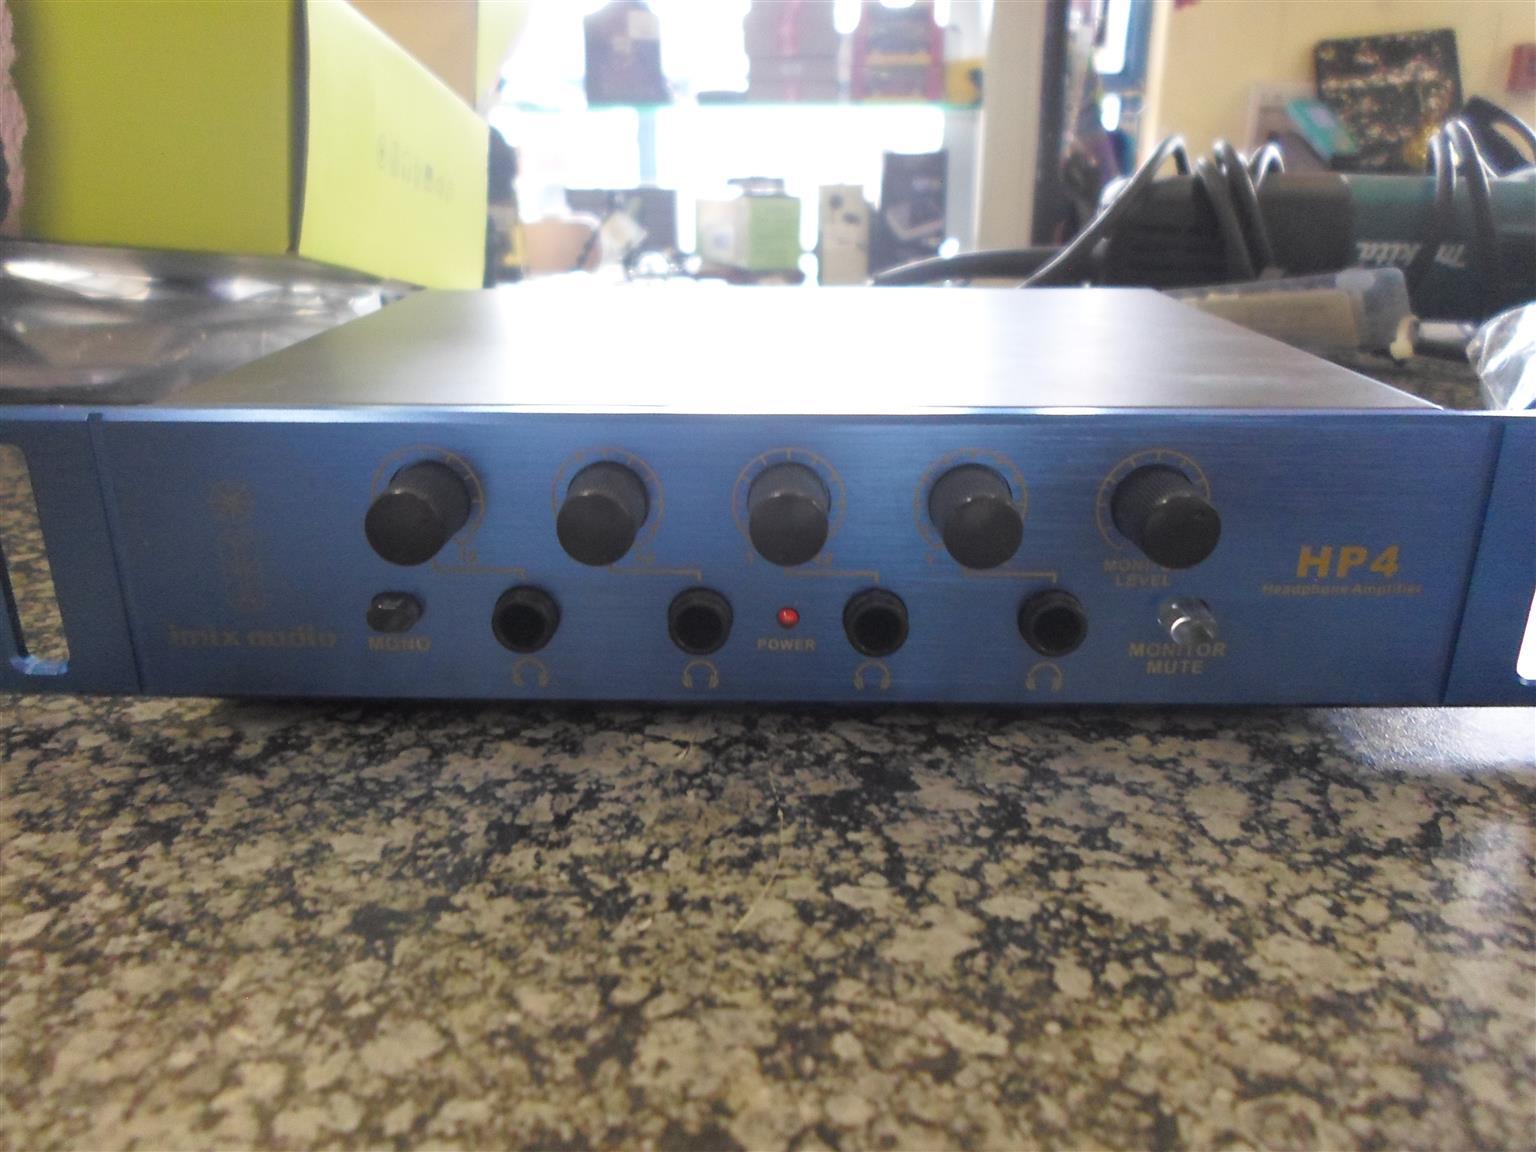 IMIX 4,6,8 Channel Headphone Amplifier